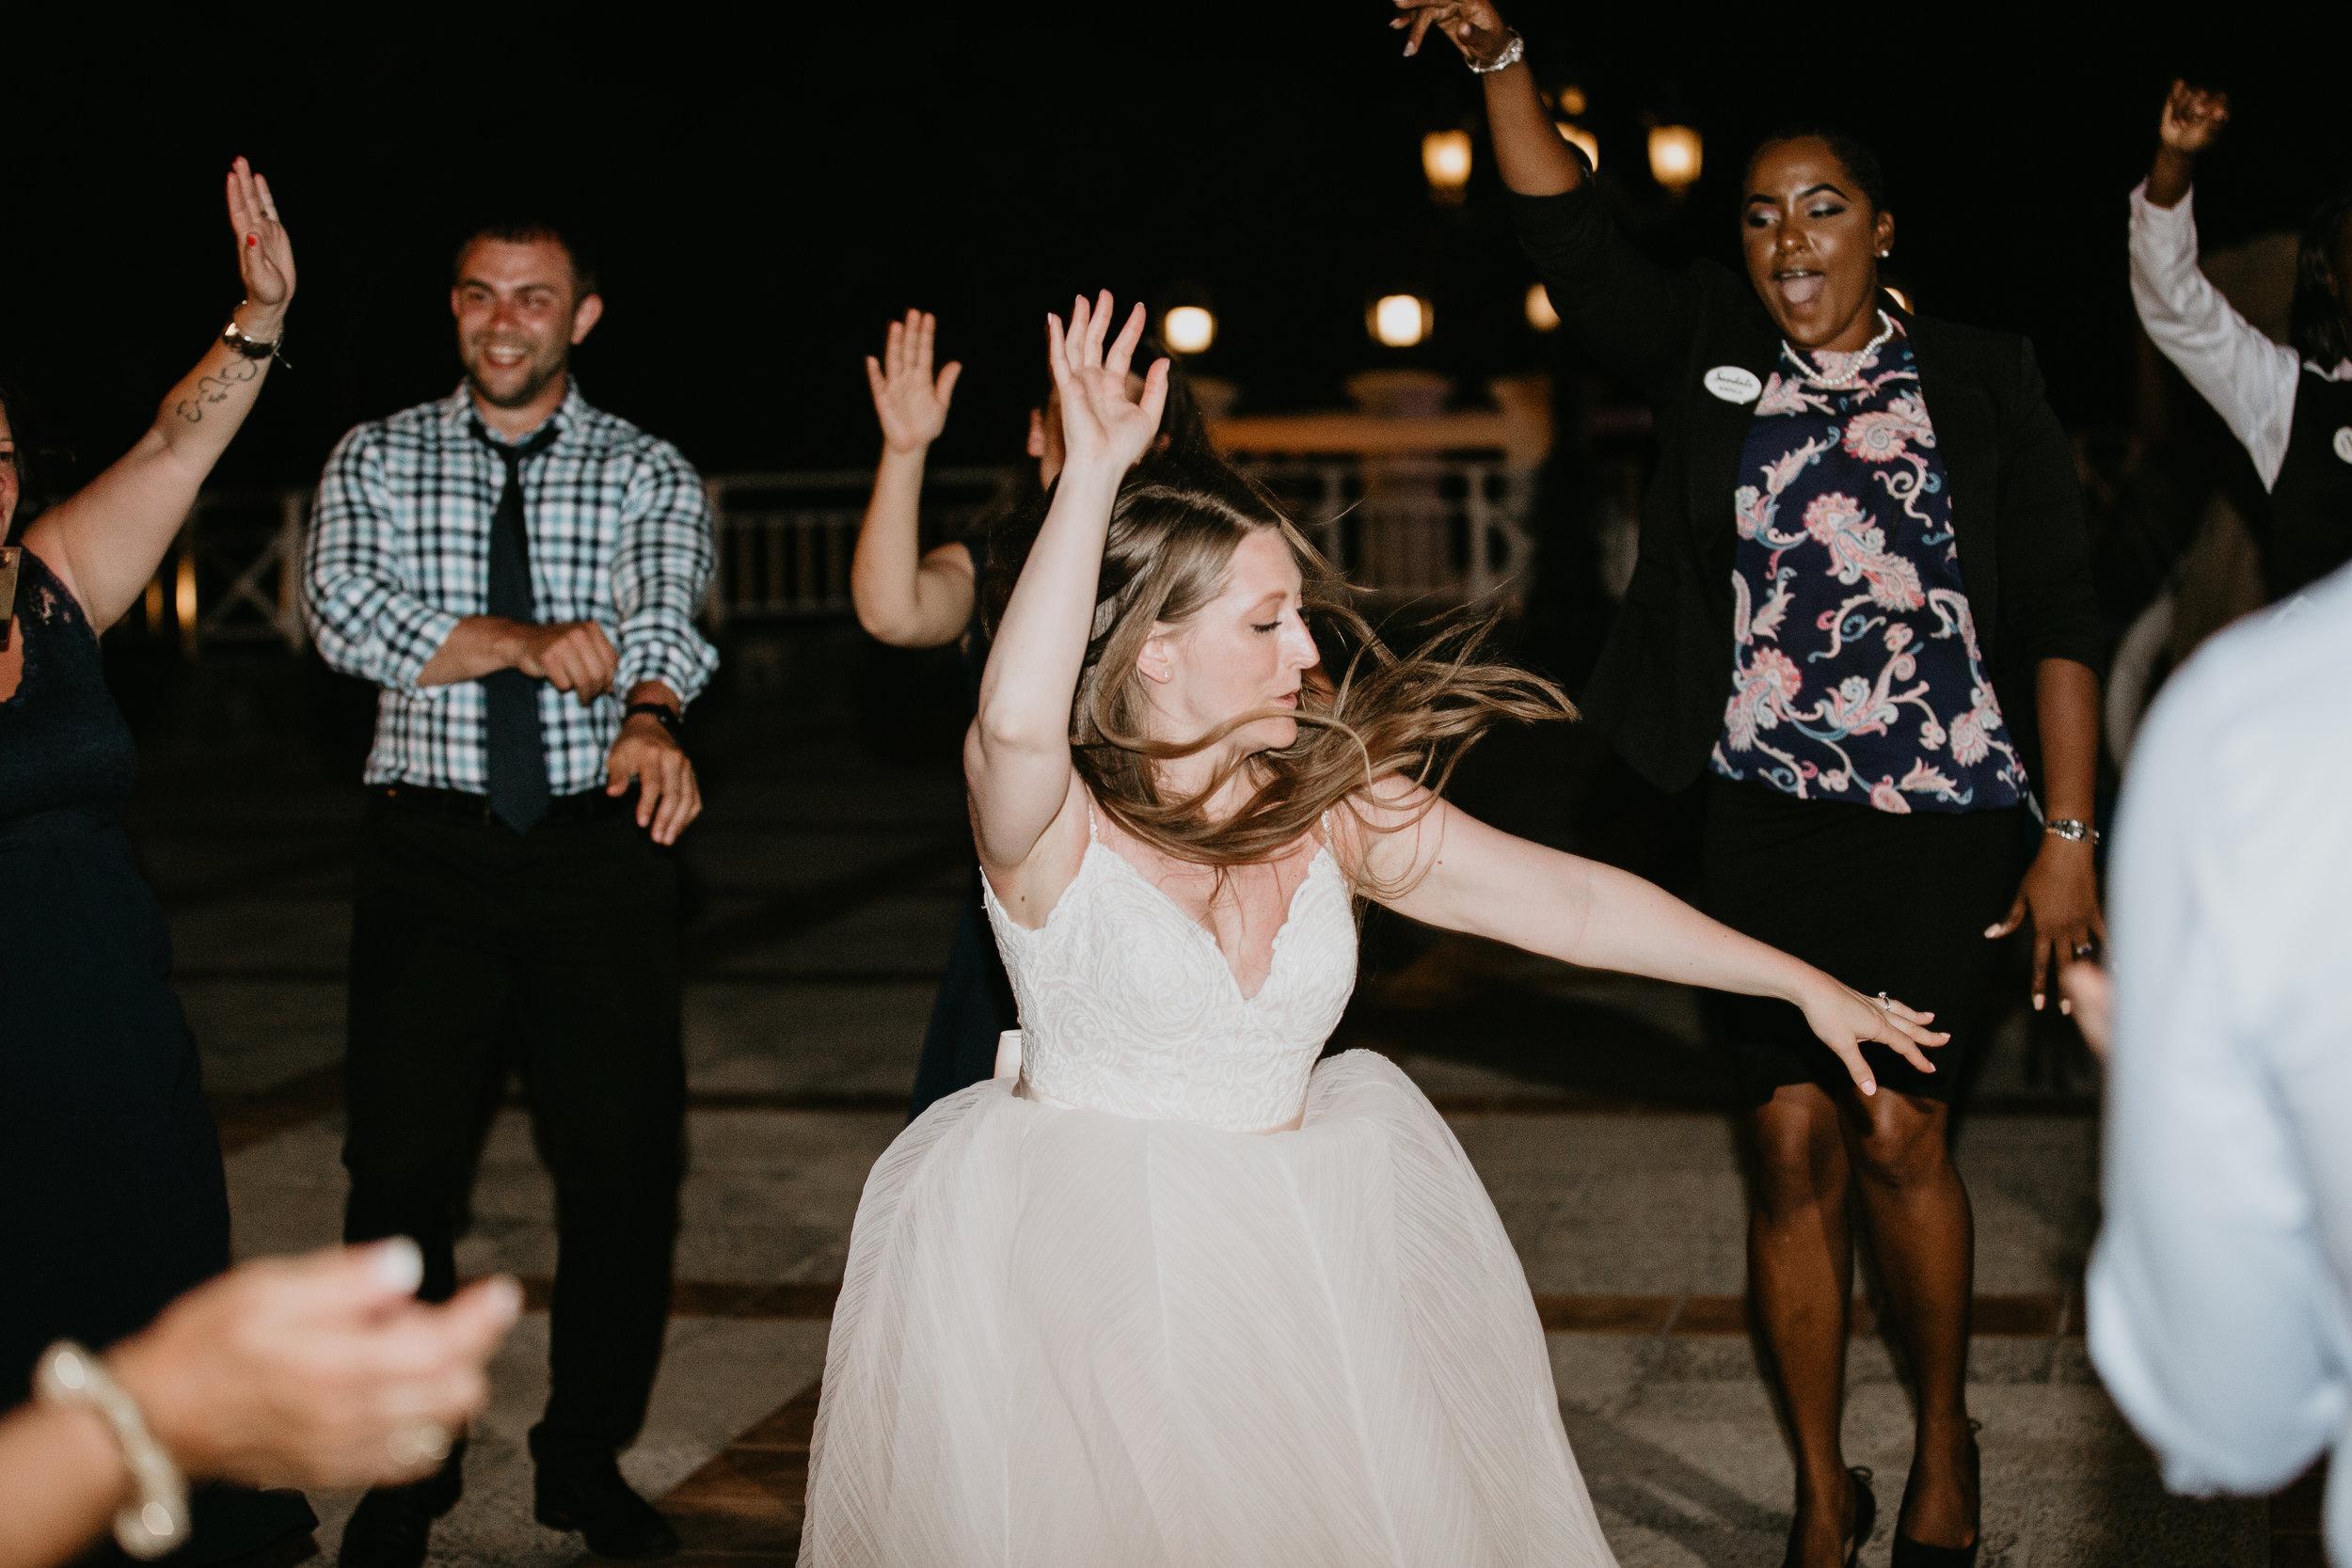 nicole-daacke-photography-destination-wedding-in-st-lucia-sandals-la-toc-intimate-island-wedding-carribean-elopement-photographer-chill-island-wedding-156.jpg